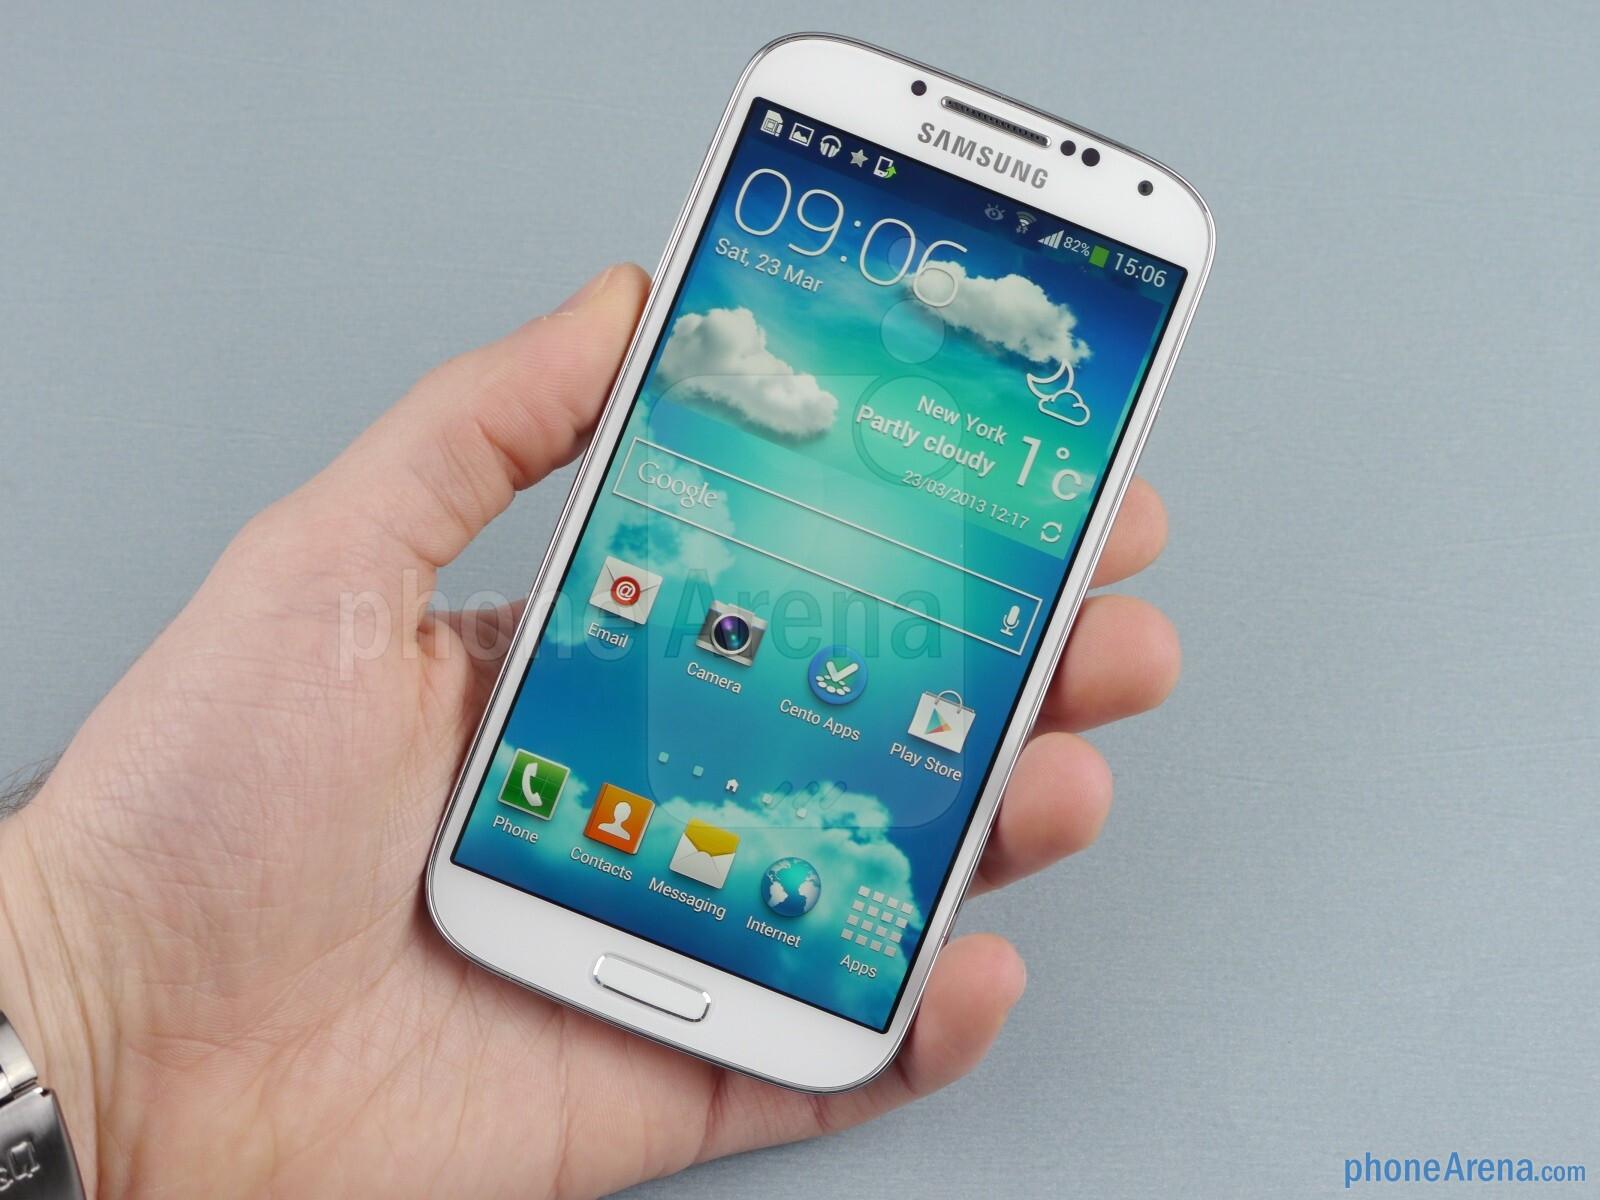 Samsung Galaxy S4 Review - PhoneArena